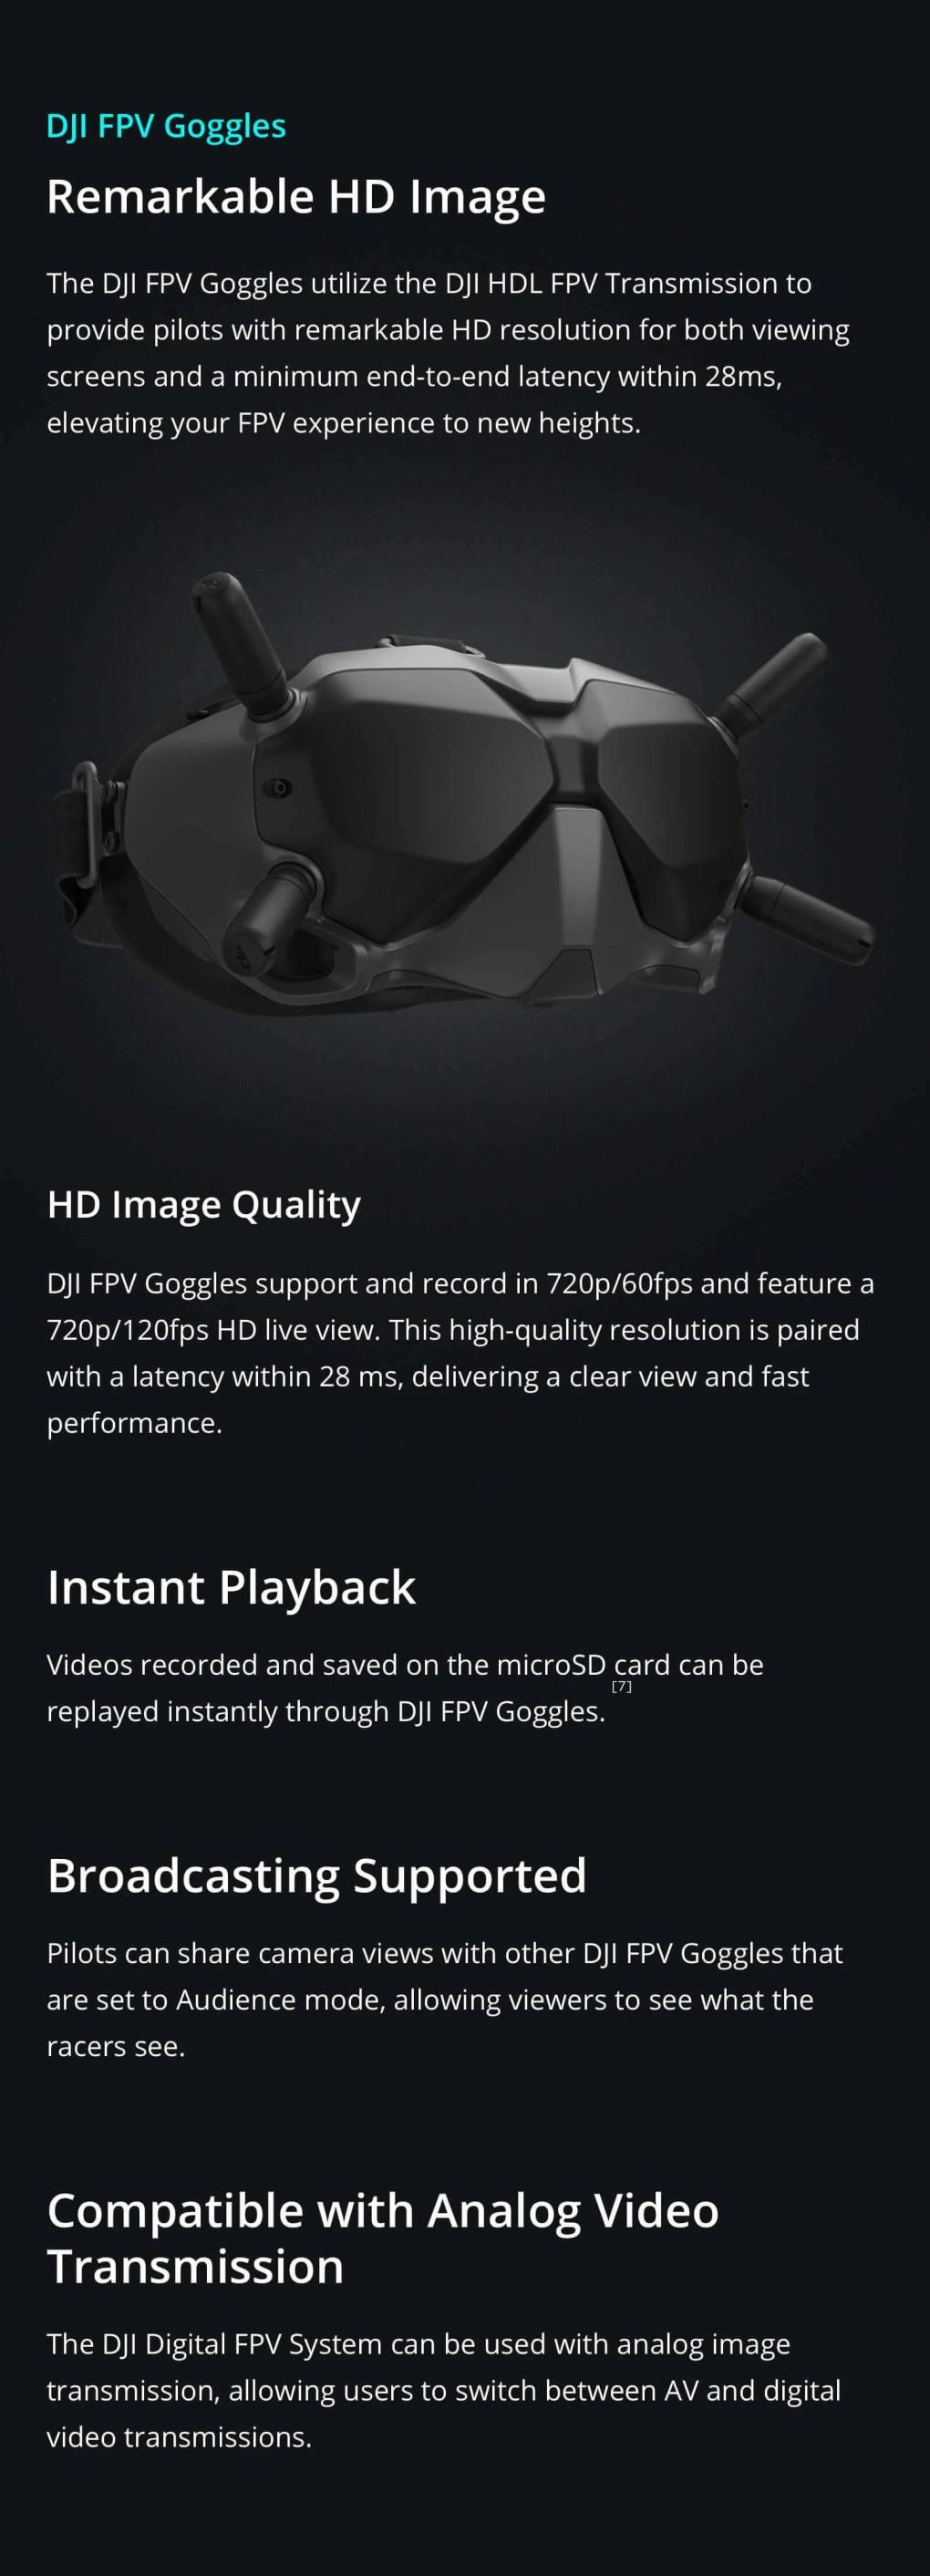 DJI FPV HD Goggles digital and analogue